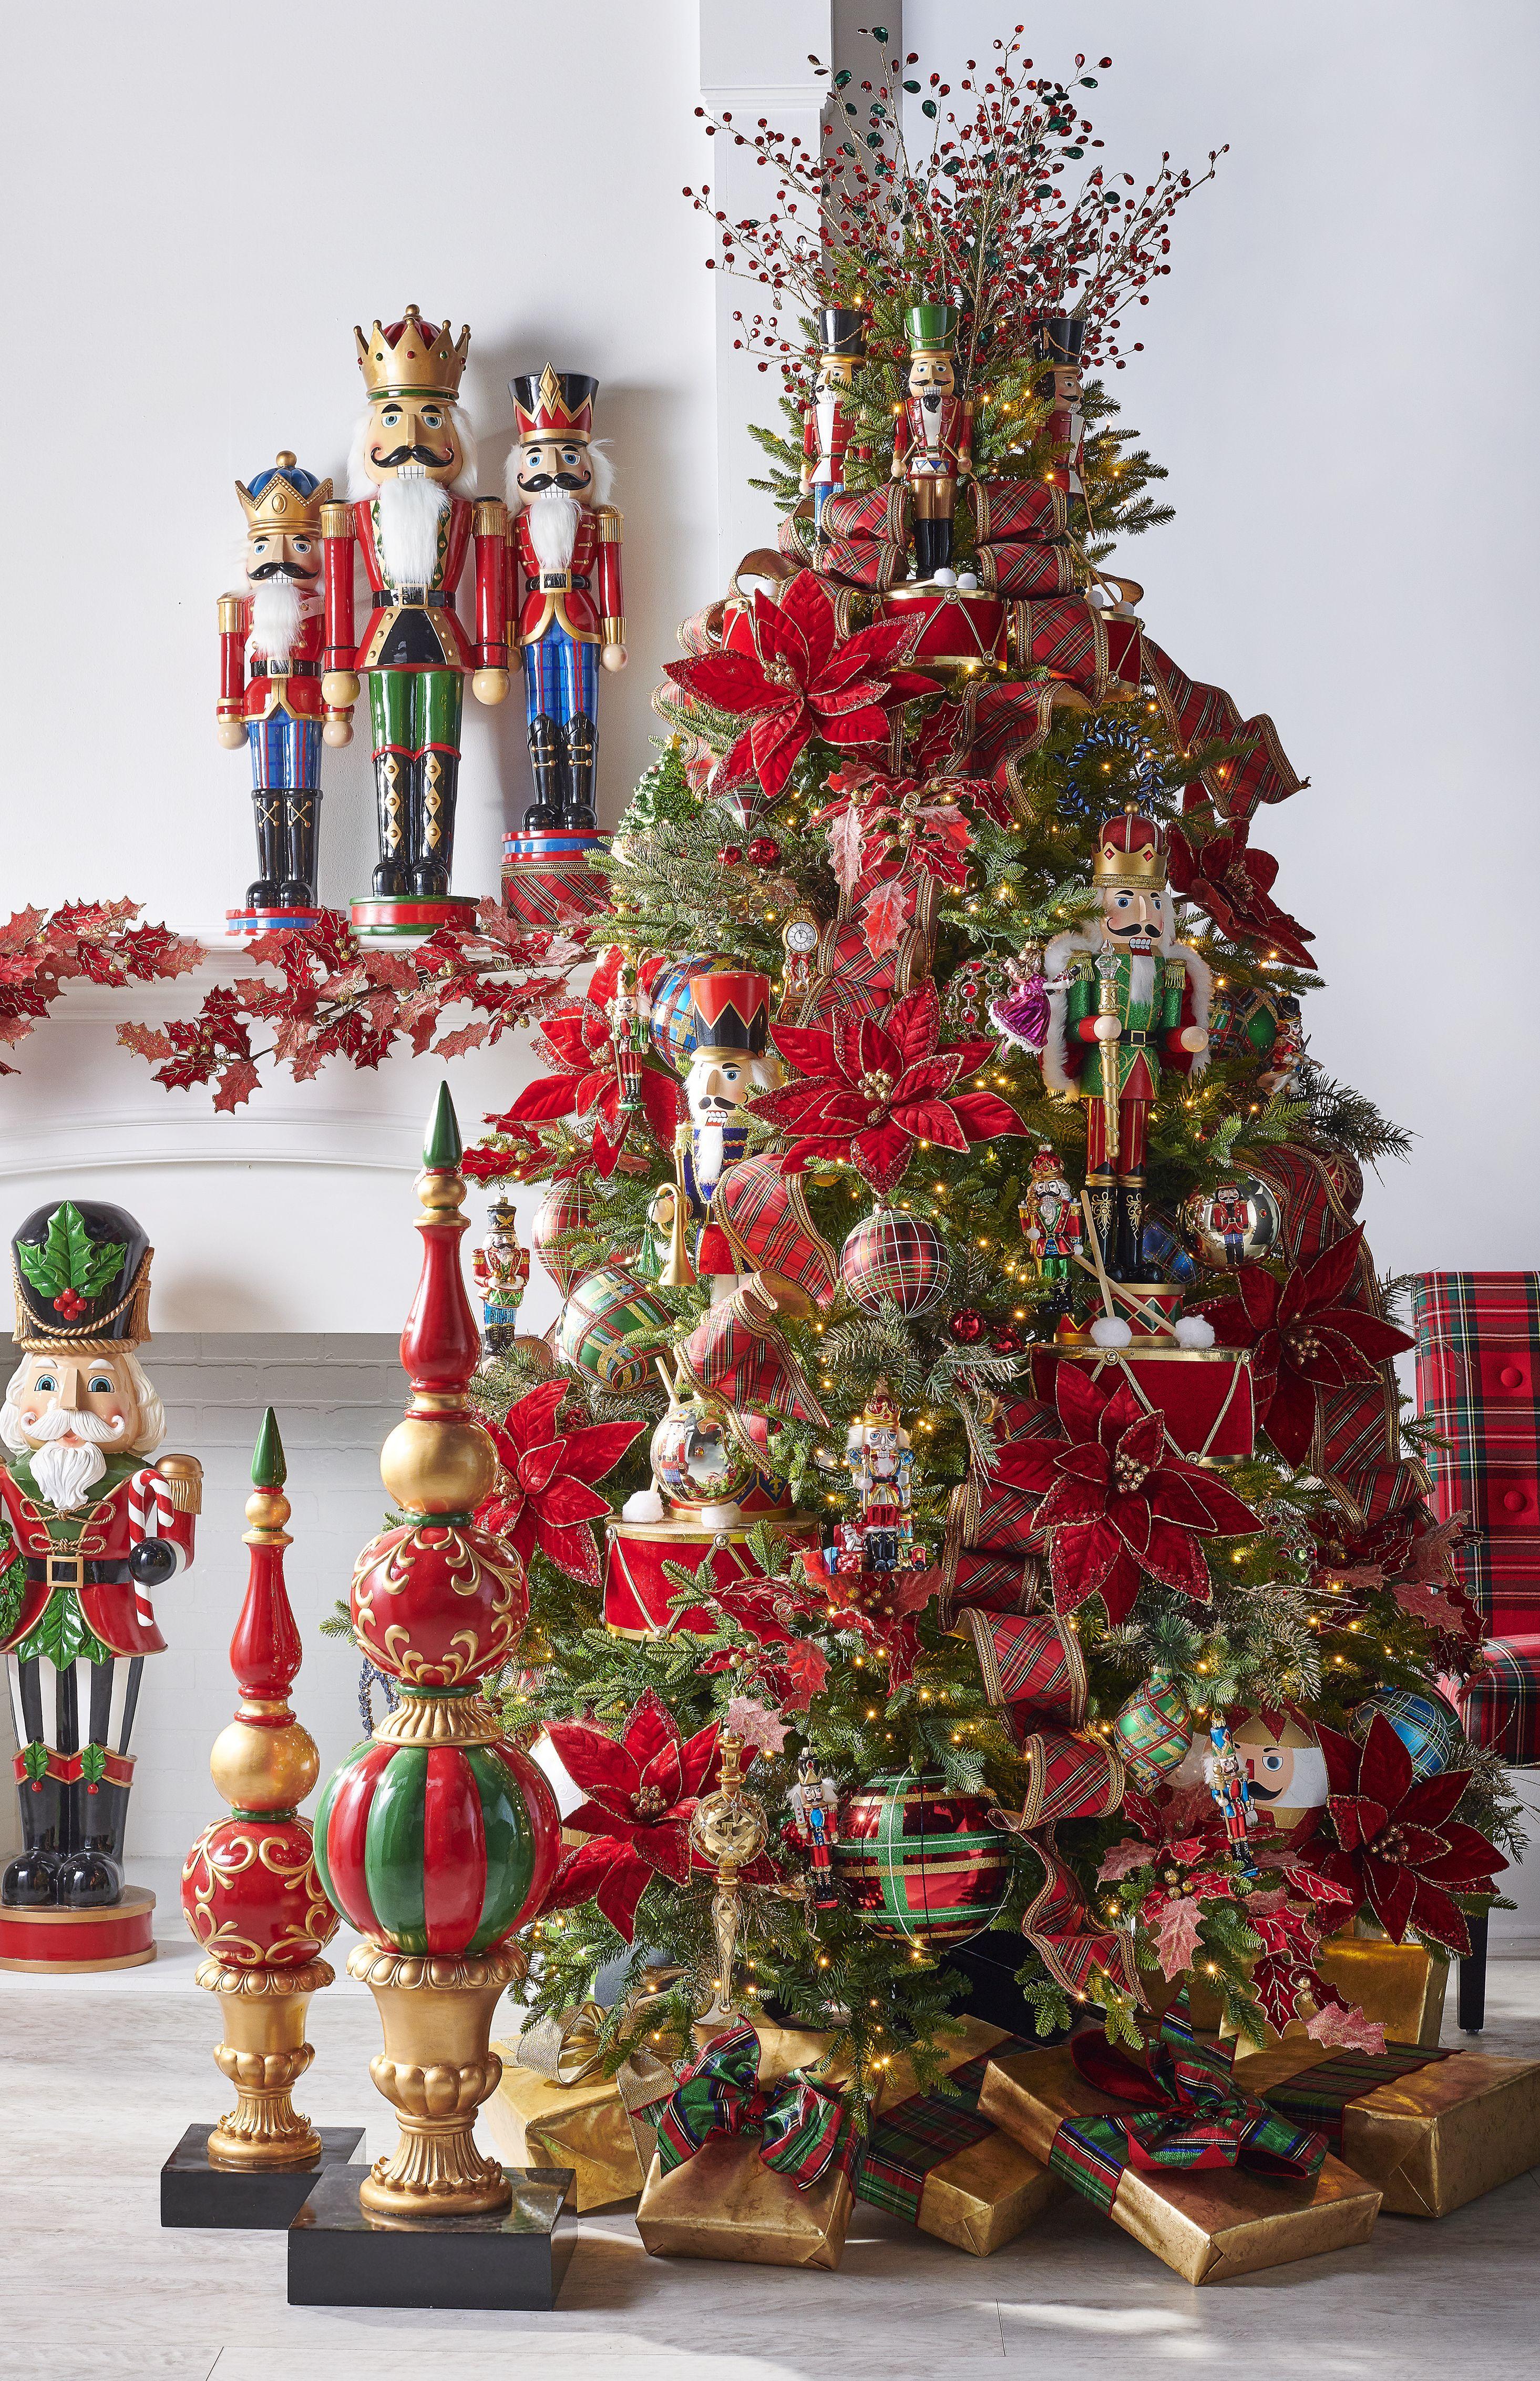 Nutcracker Traditions In 2020 Nutcracker Christmas Tree Nutcracker Christmas Decorations Christmas Tree Themes